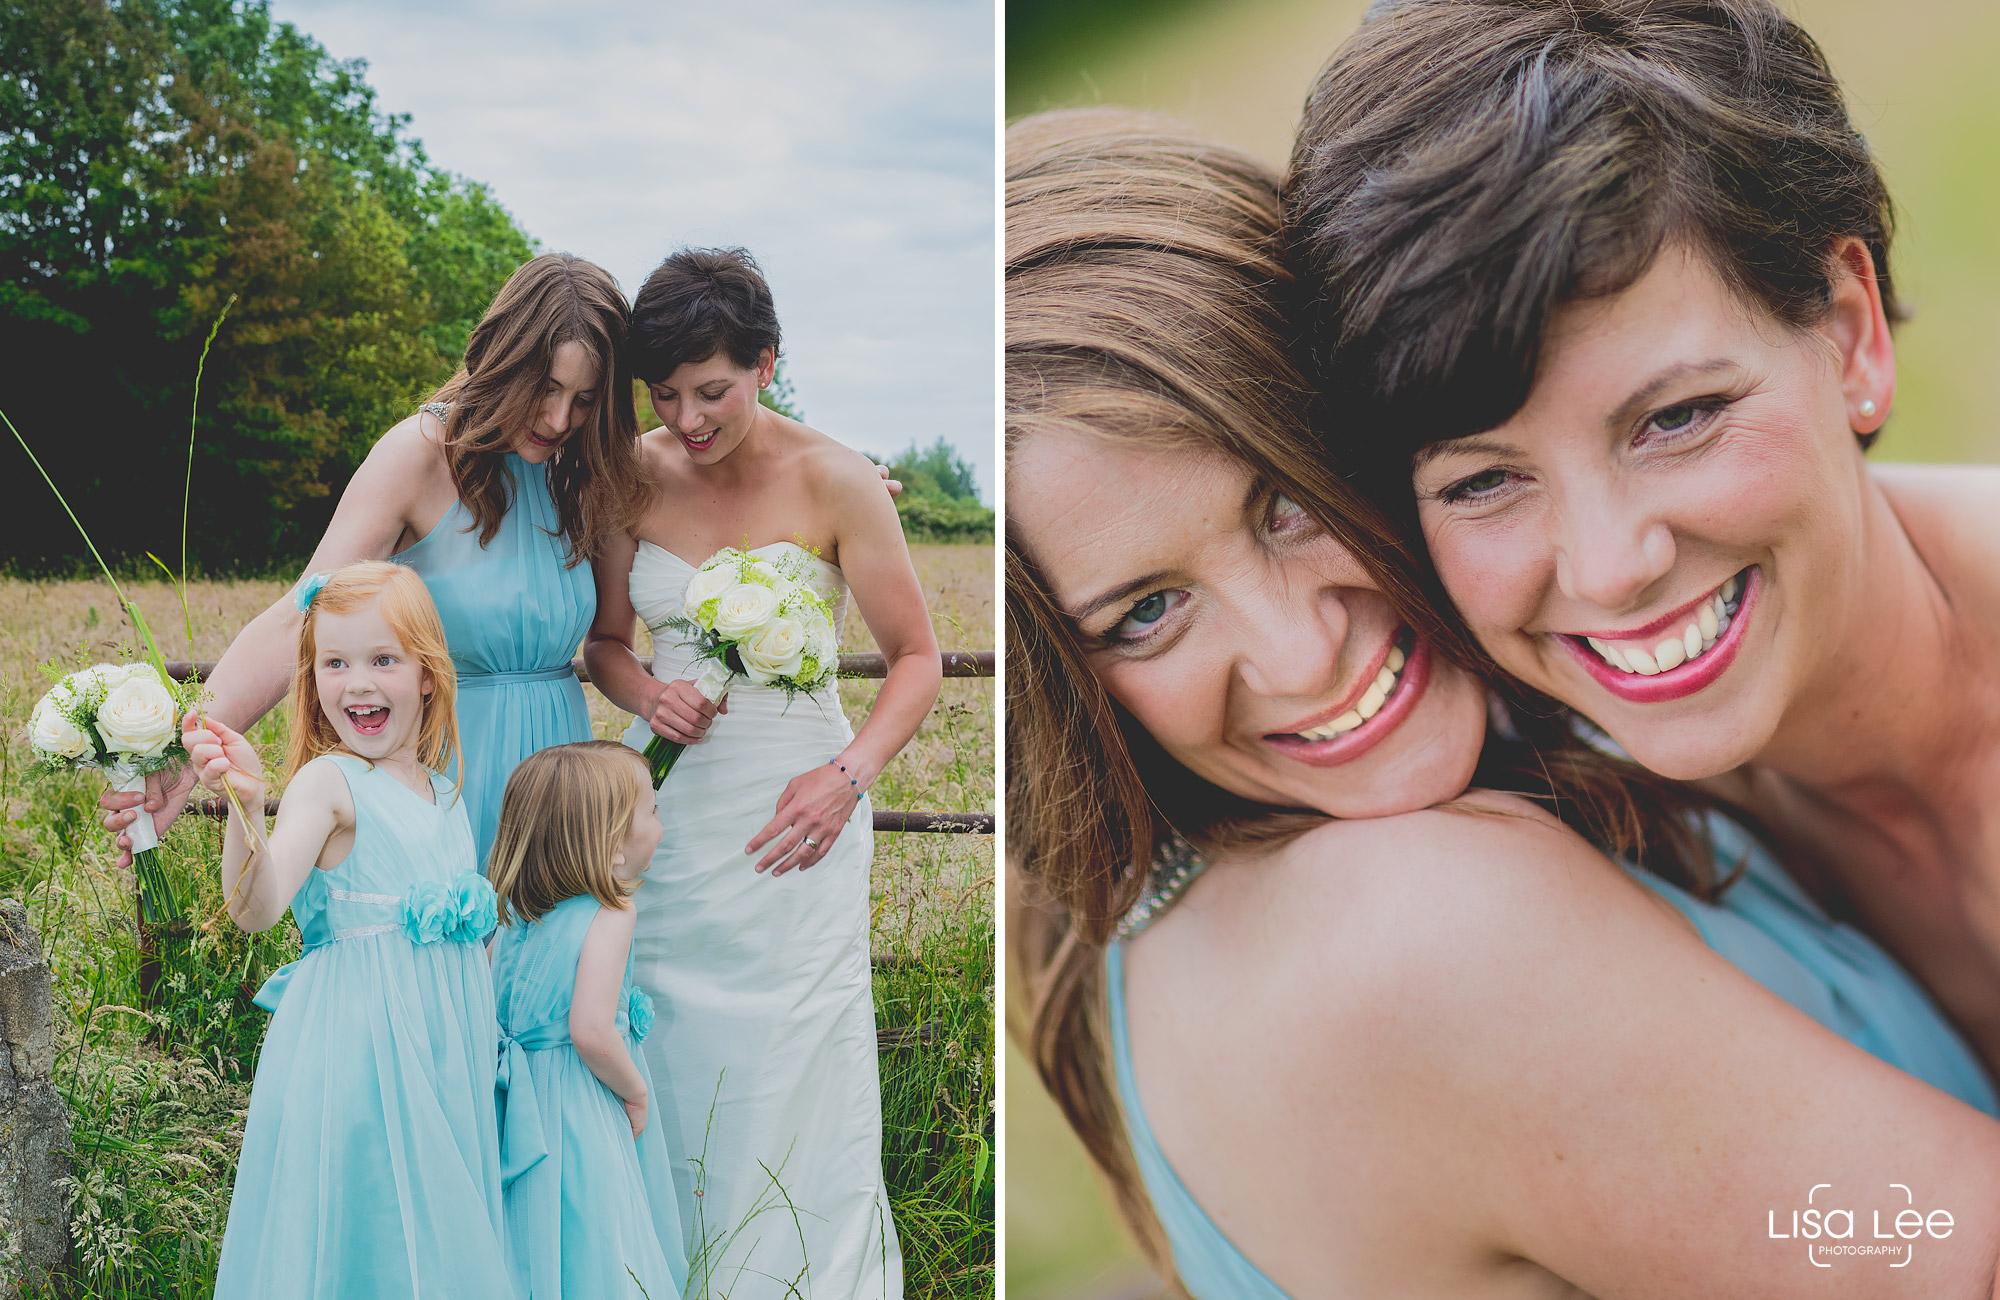 lisa-lee-wedding-photography-burton-bridesmaids.jpg